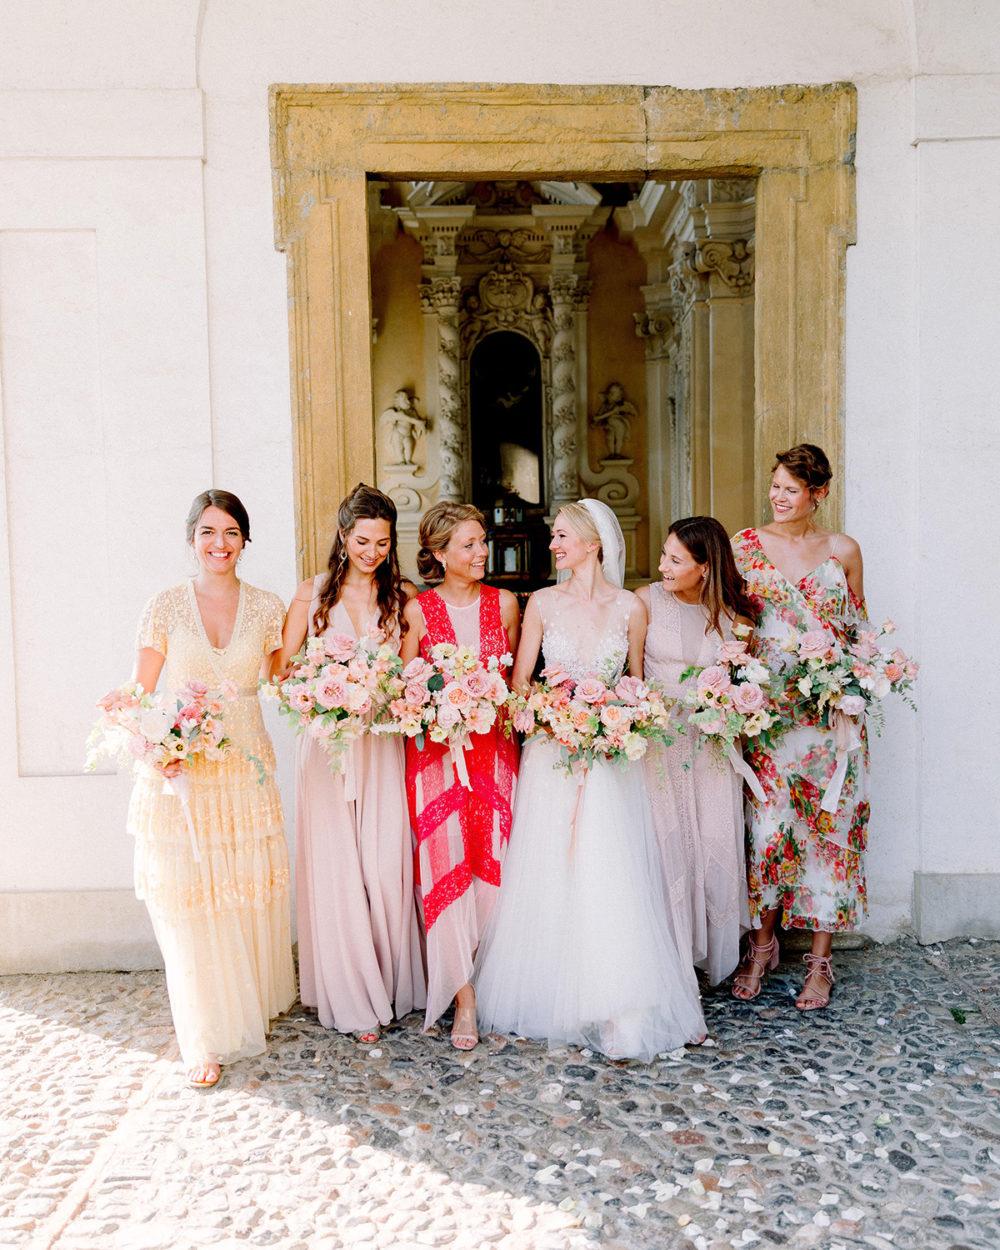 TML Tabea Maria-Lisa Floral Designer Swiss Wedding Florist Portfolio Bridesmaids Destination Wedding Lugano Morcote